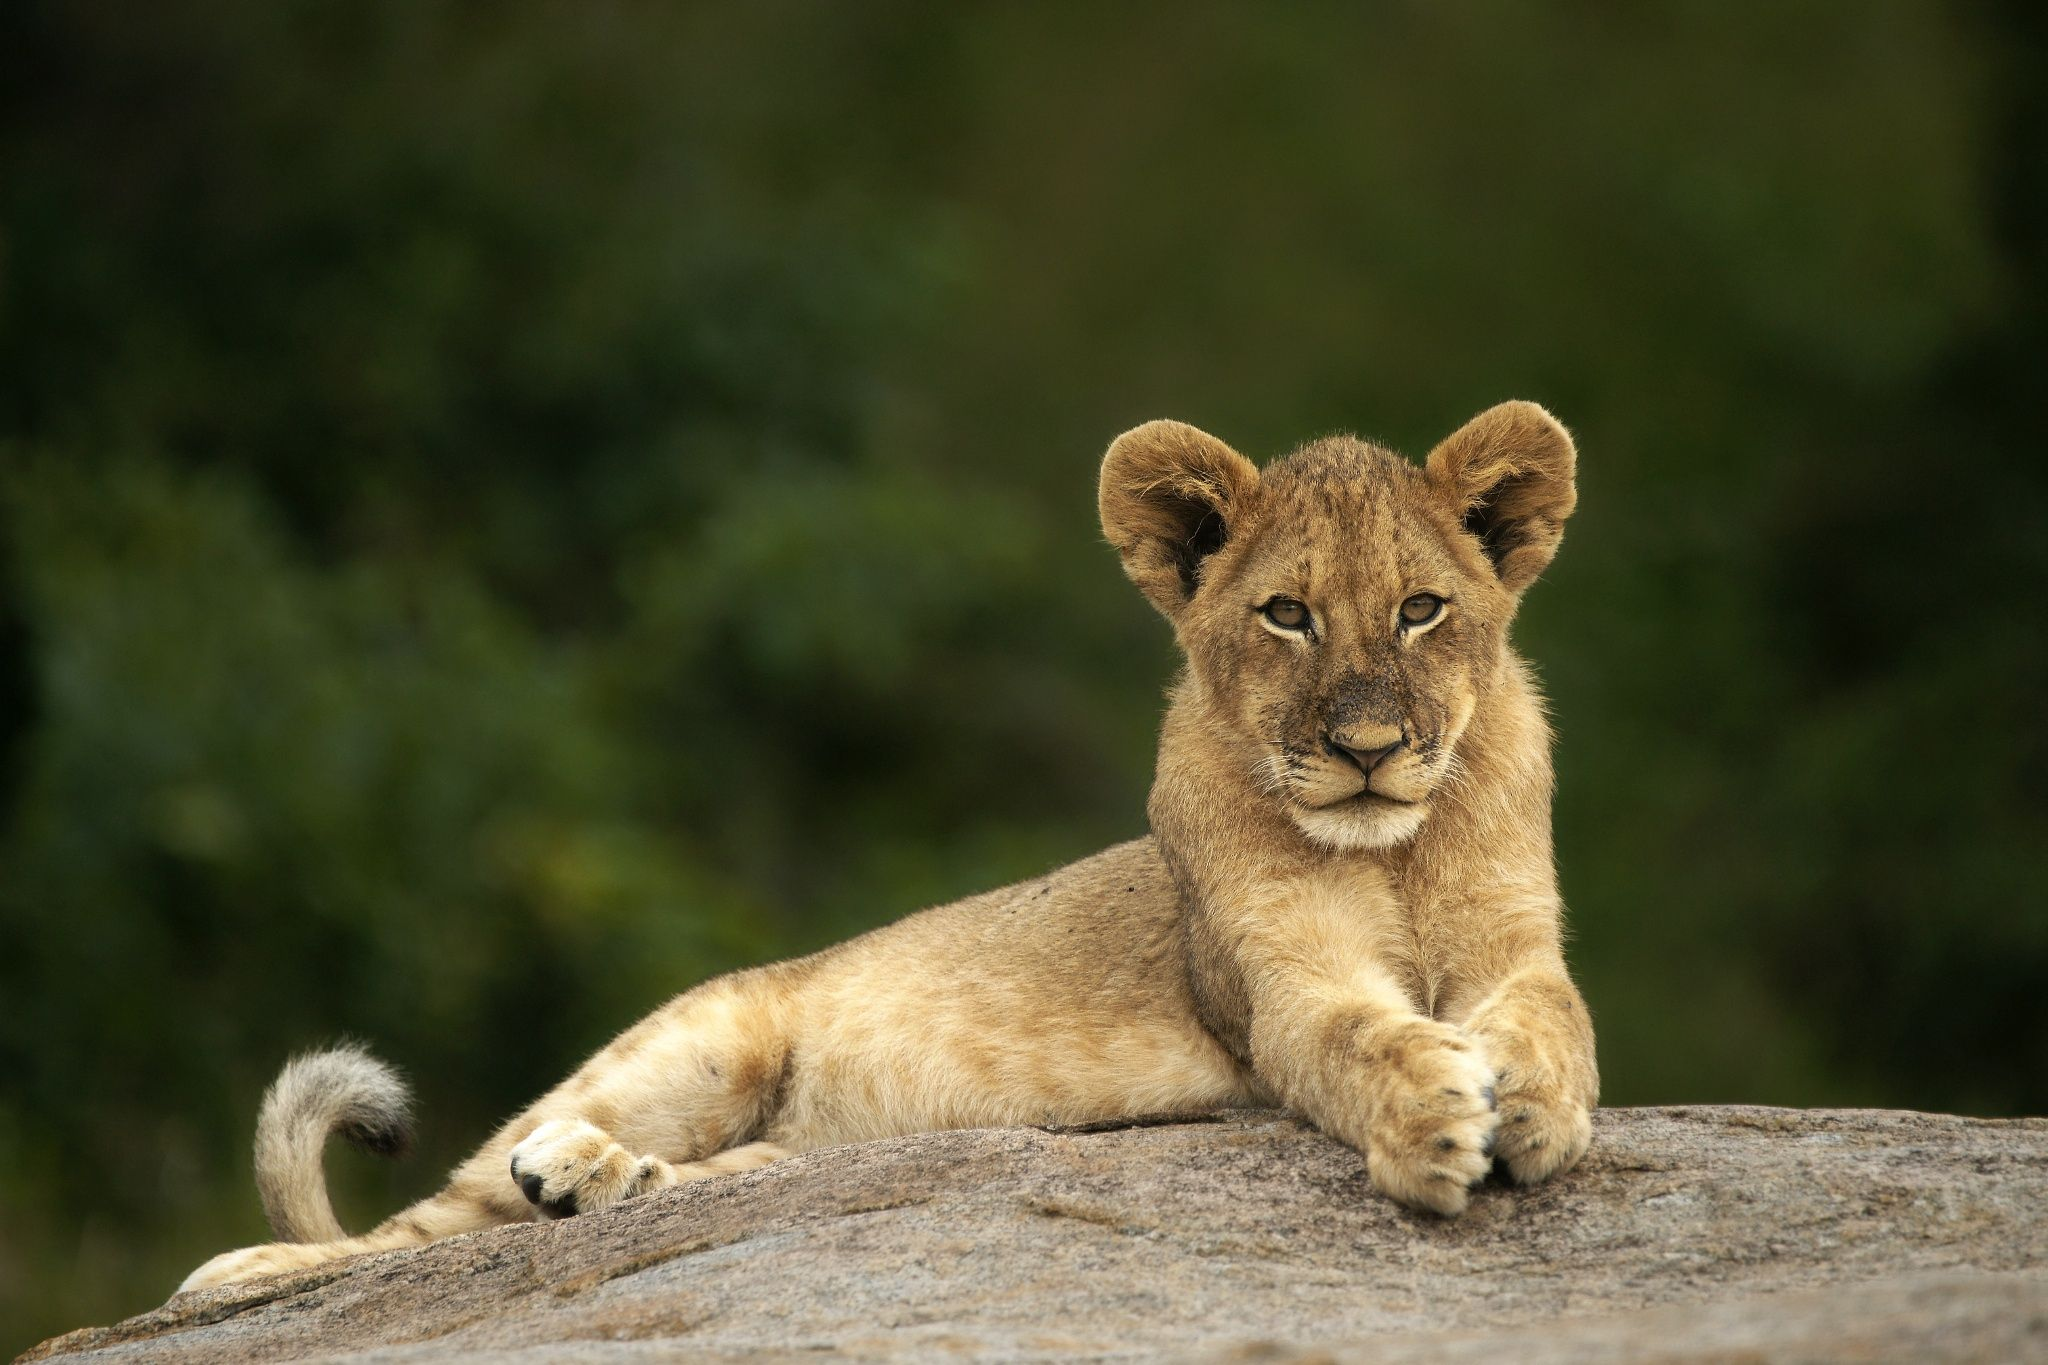 Lion Cub Lookout by Rudi Hulshof - Photo 17619269 - 500px